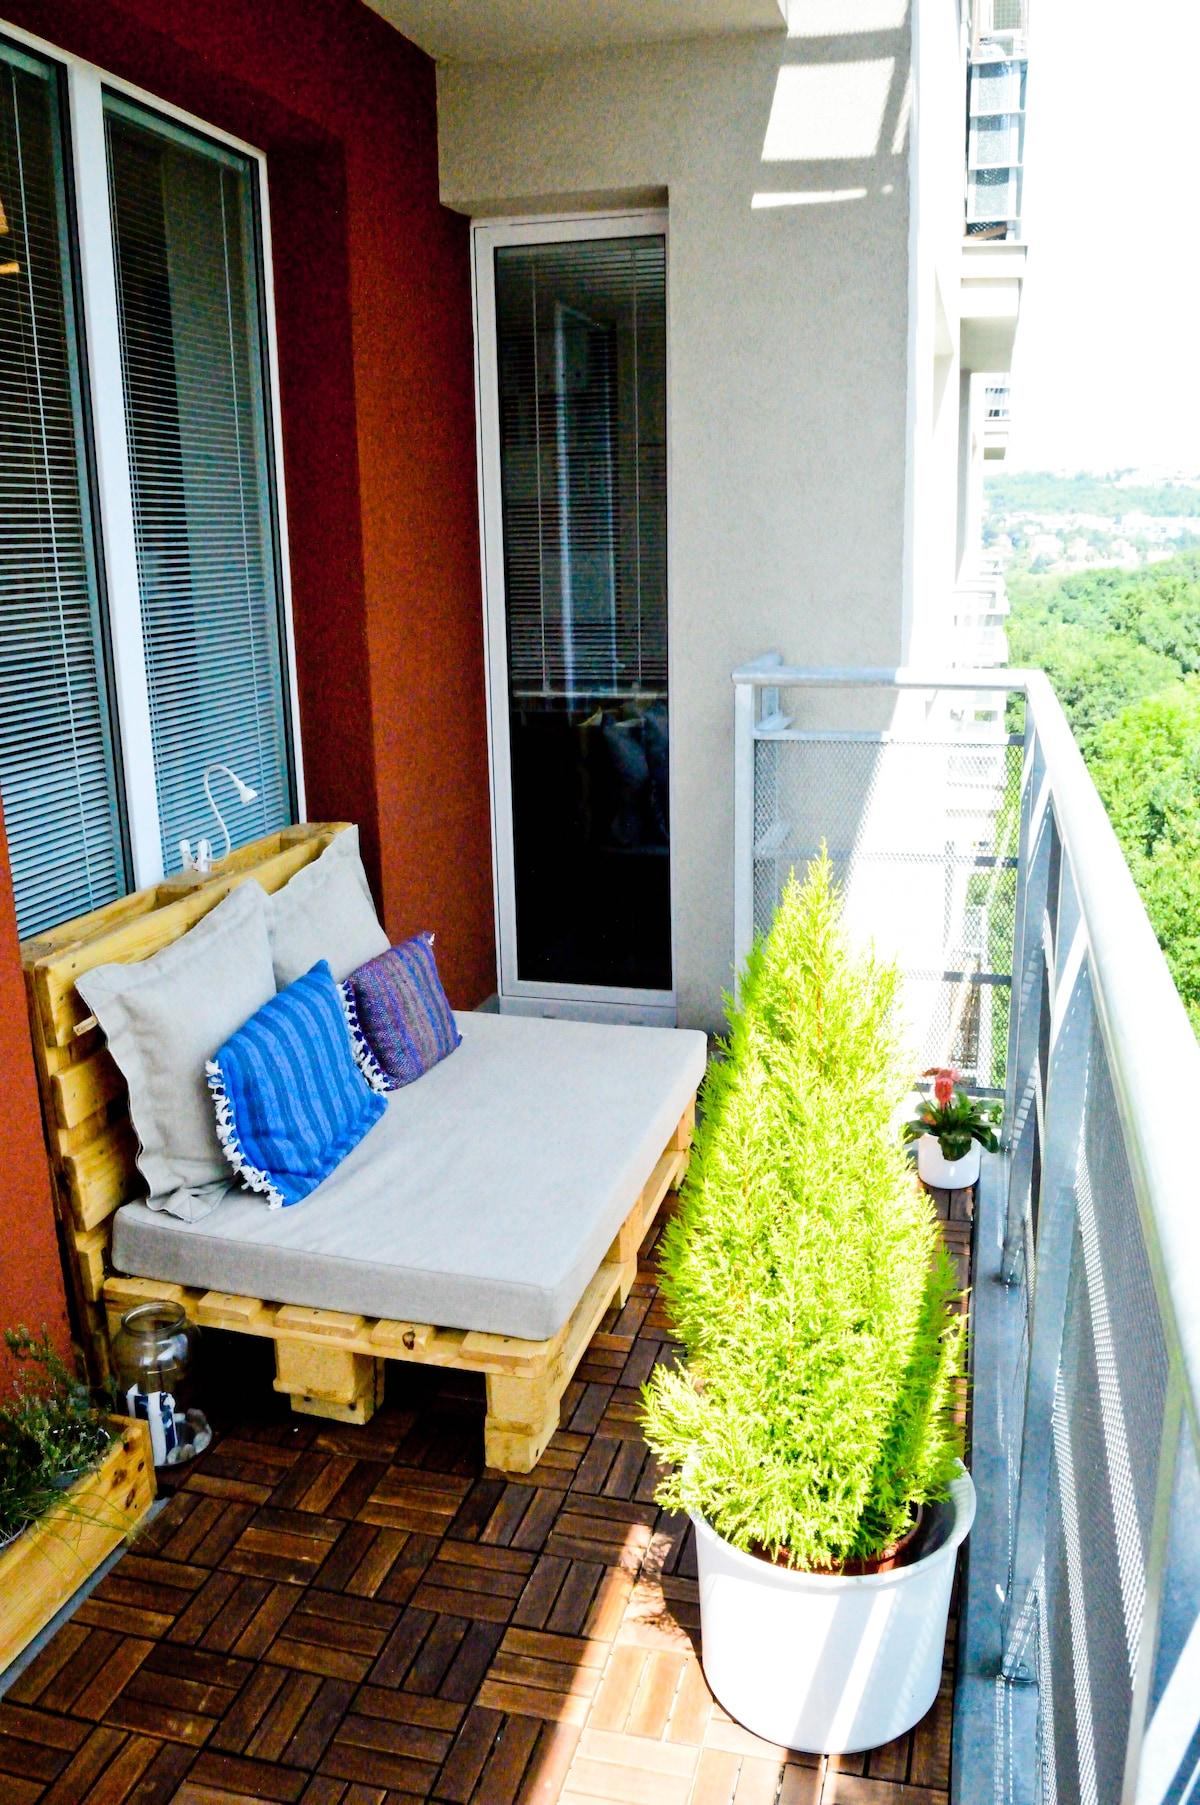 Spacious apartment & sunny terrace